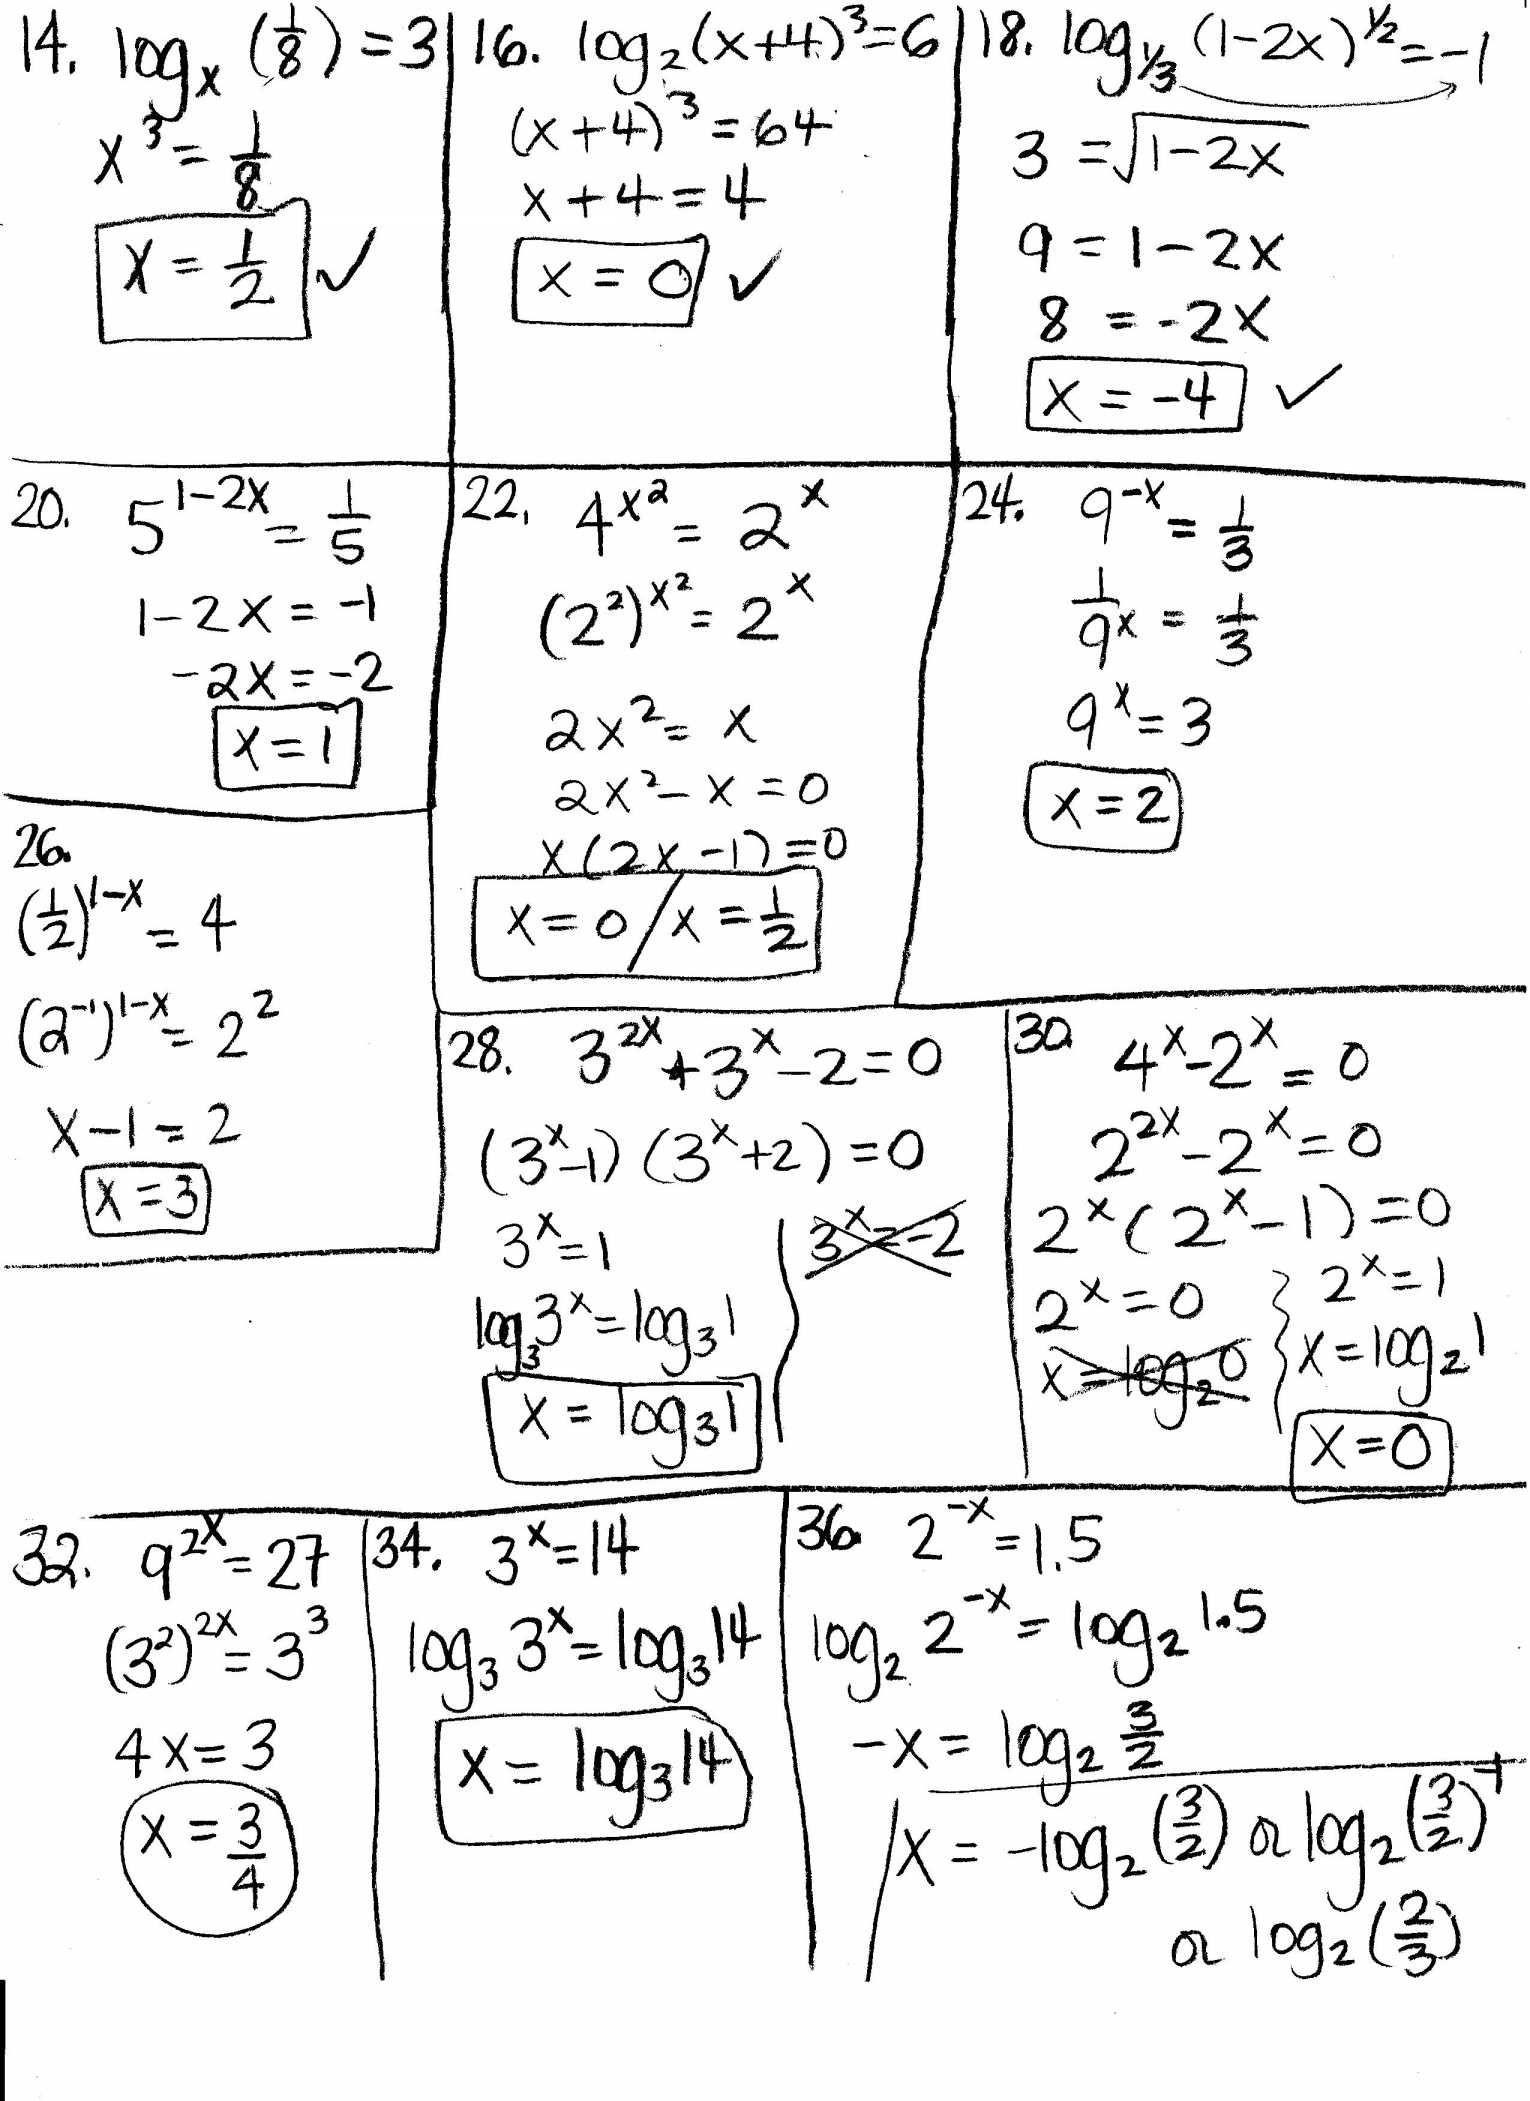 Solving Logarithmic Equations Worksheet Logarithmic Equations Worksheet with Answers Worksheet List